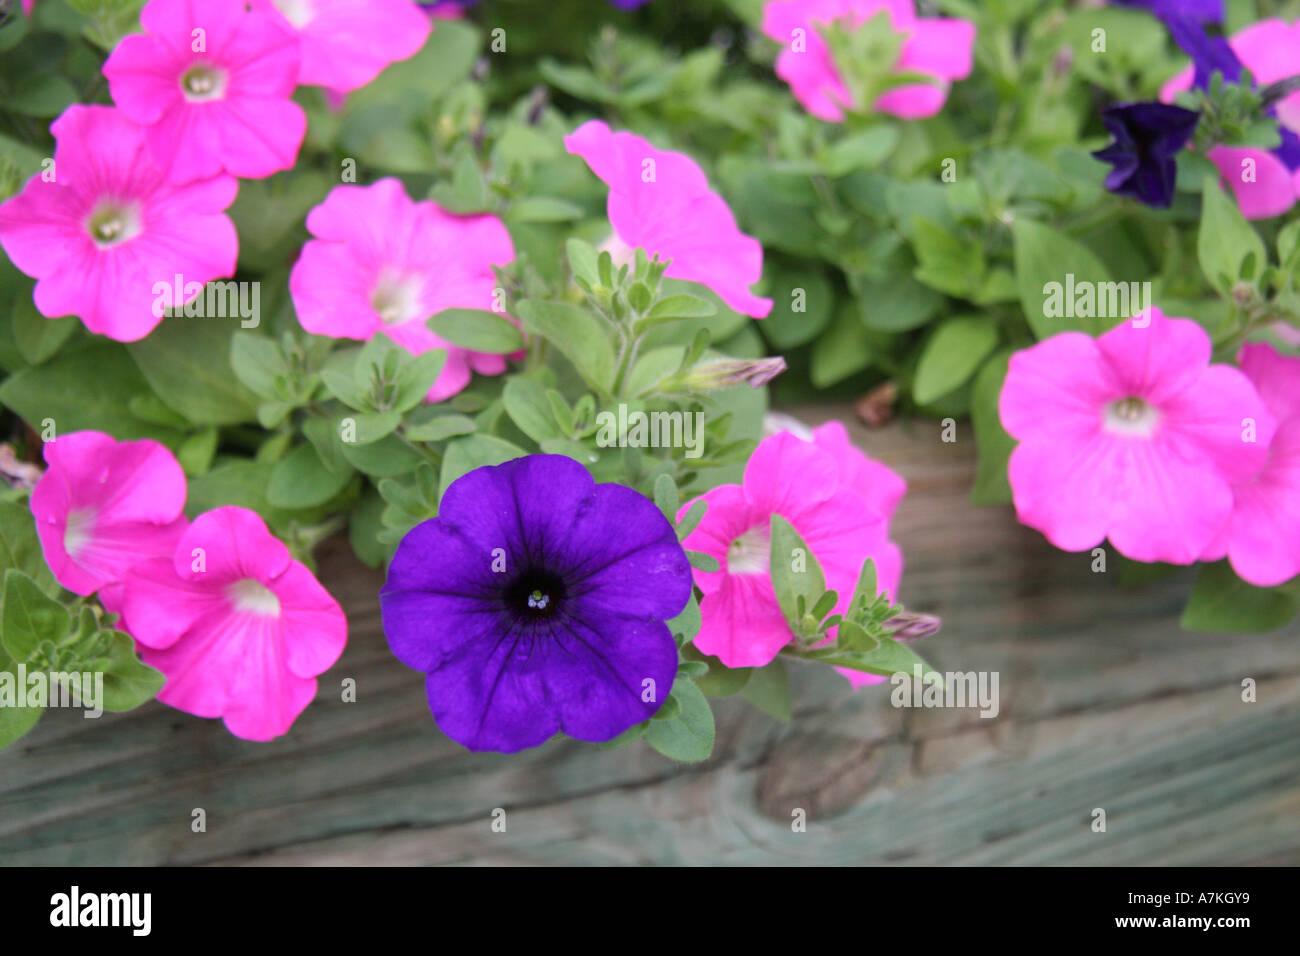 Pink and Blue Flowers of Baddeck, Nova Scotia - Stock Image